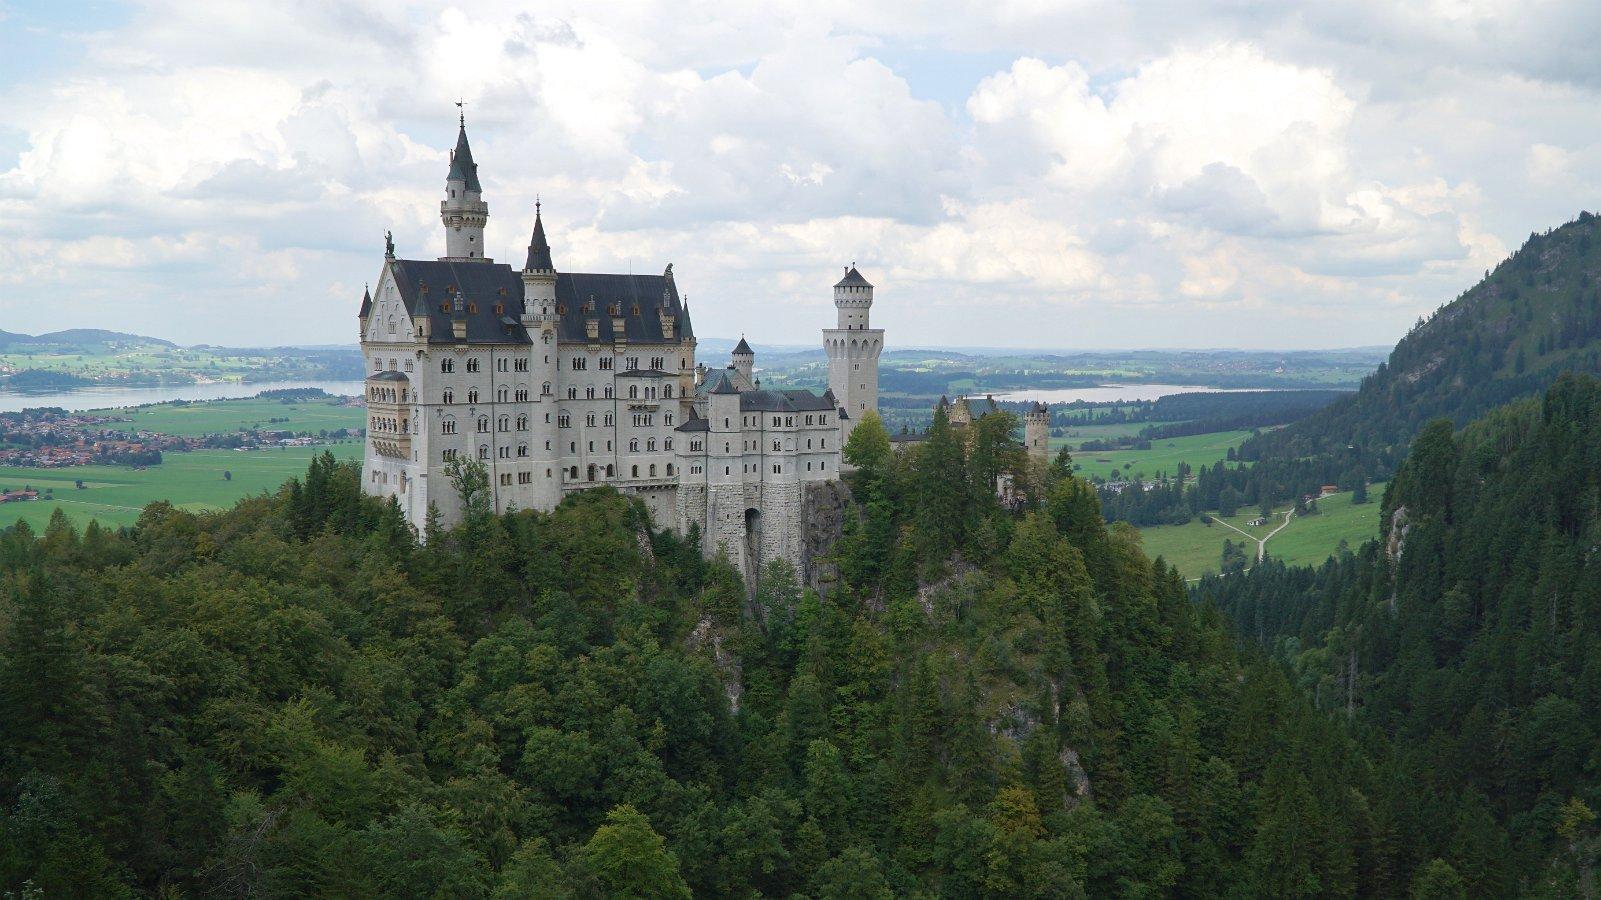 Visiting Hohenschwangau and Neuschwanstein Castles